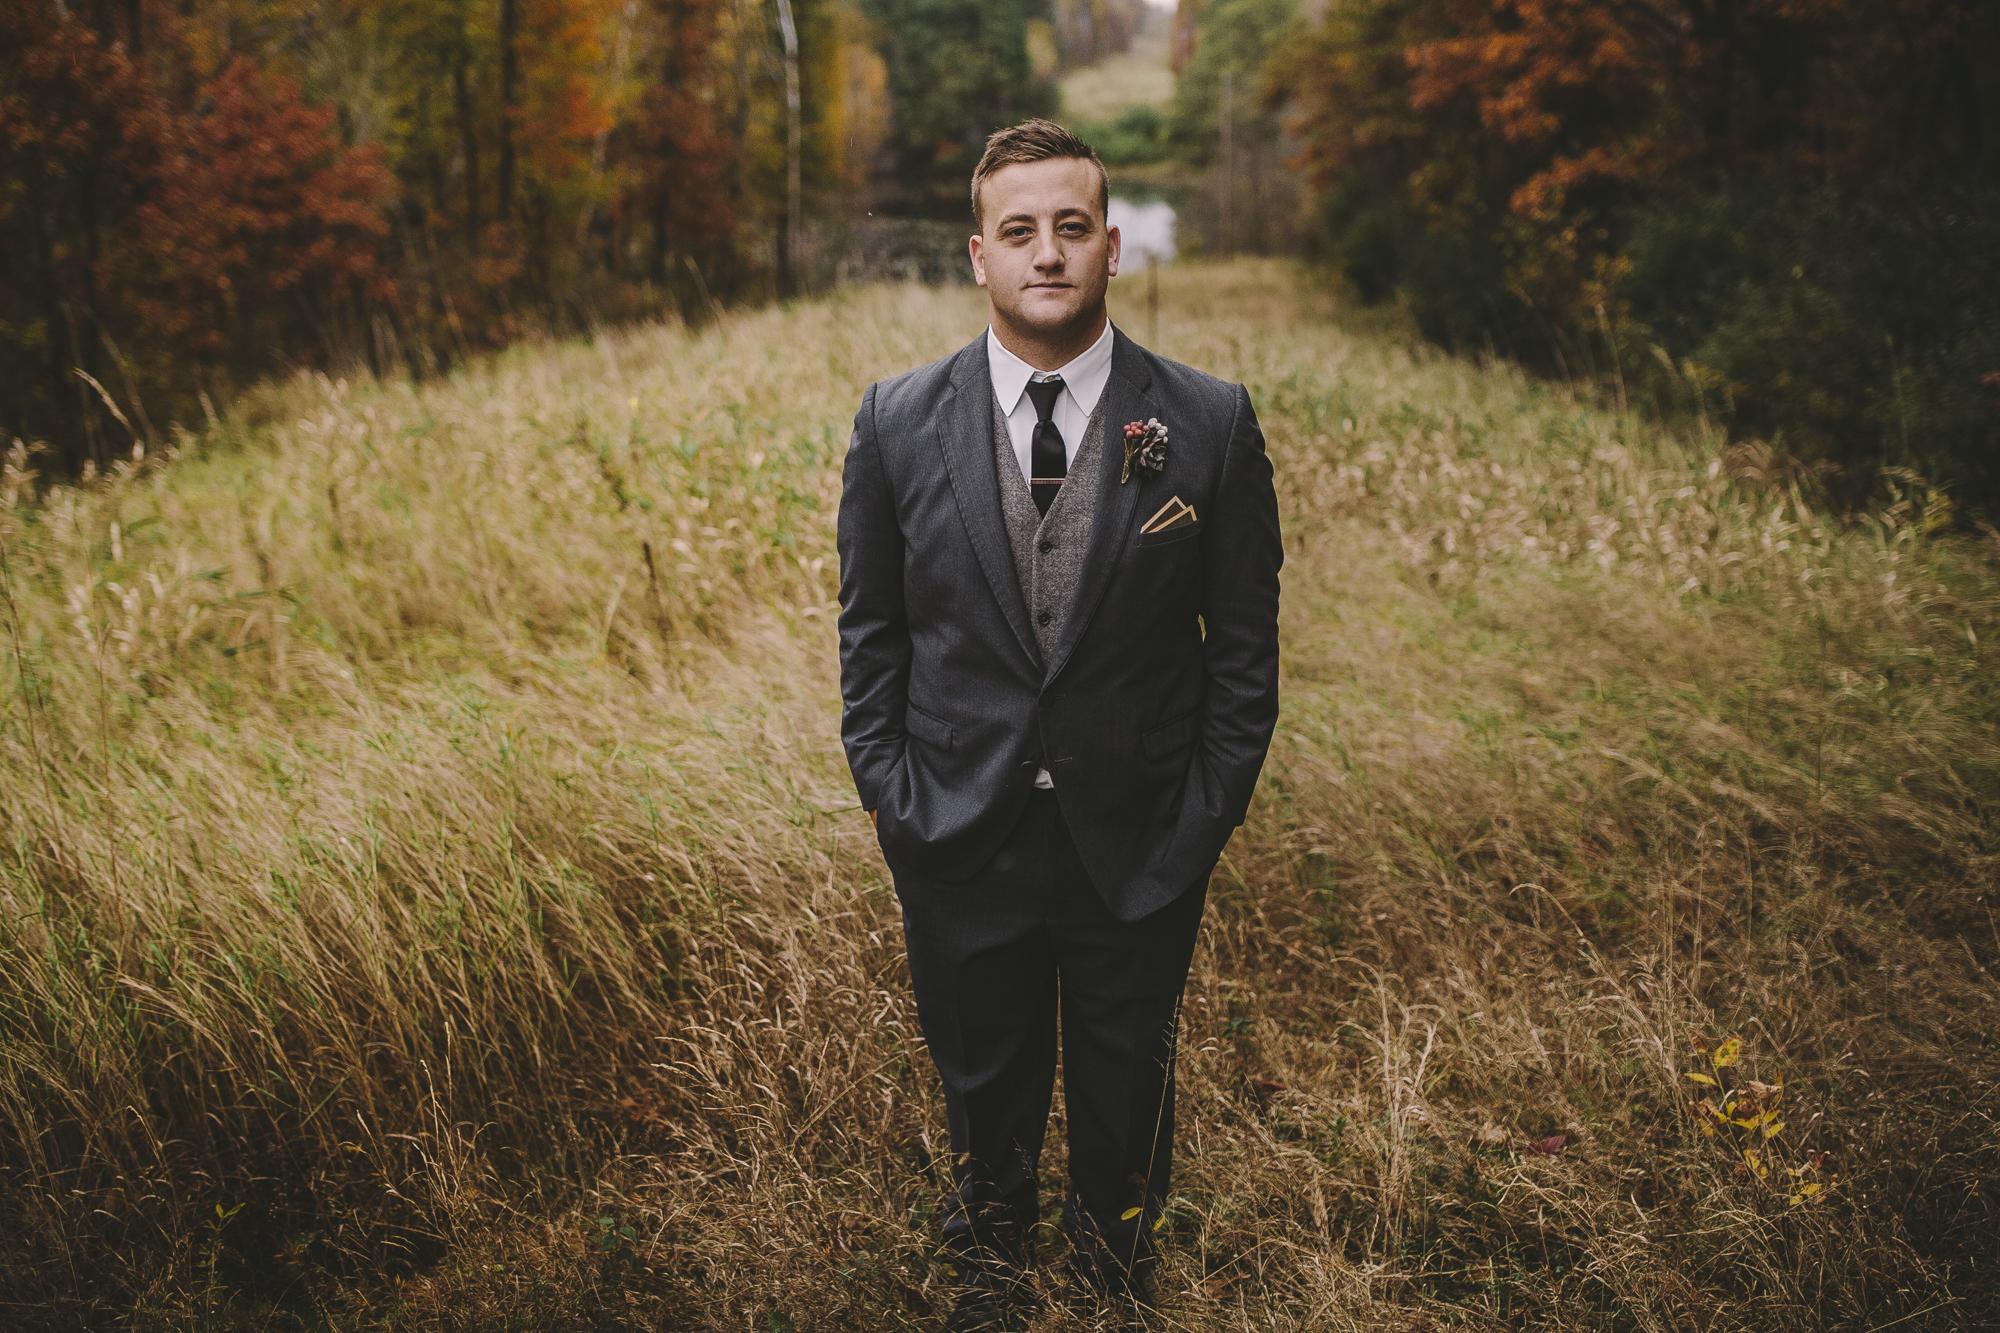 Brandon werth minnesota wedding photographer camp butwin groom